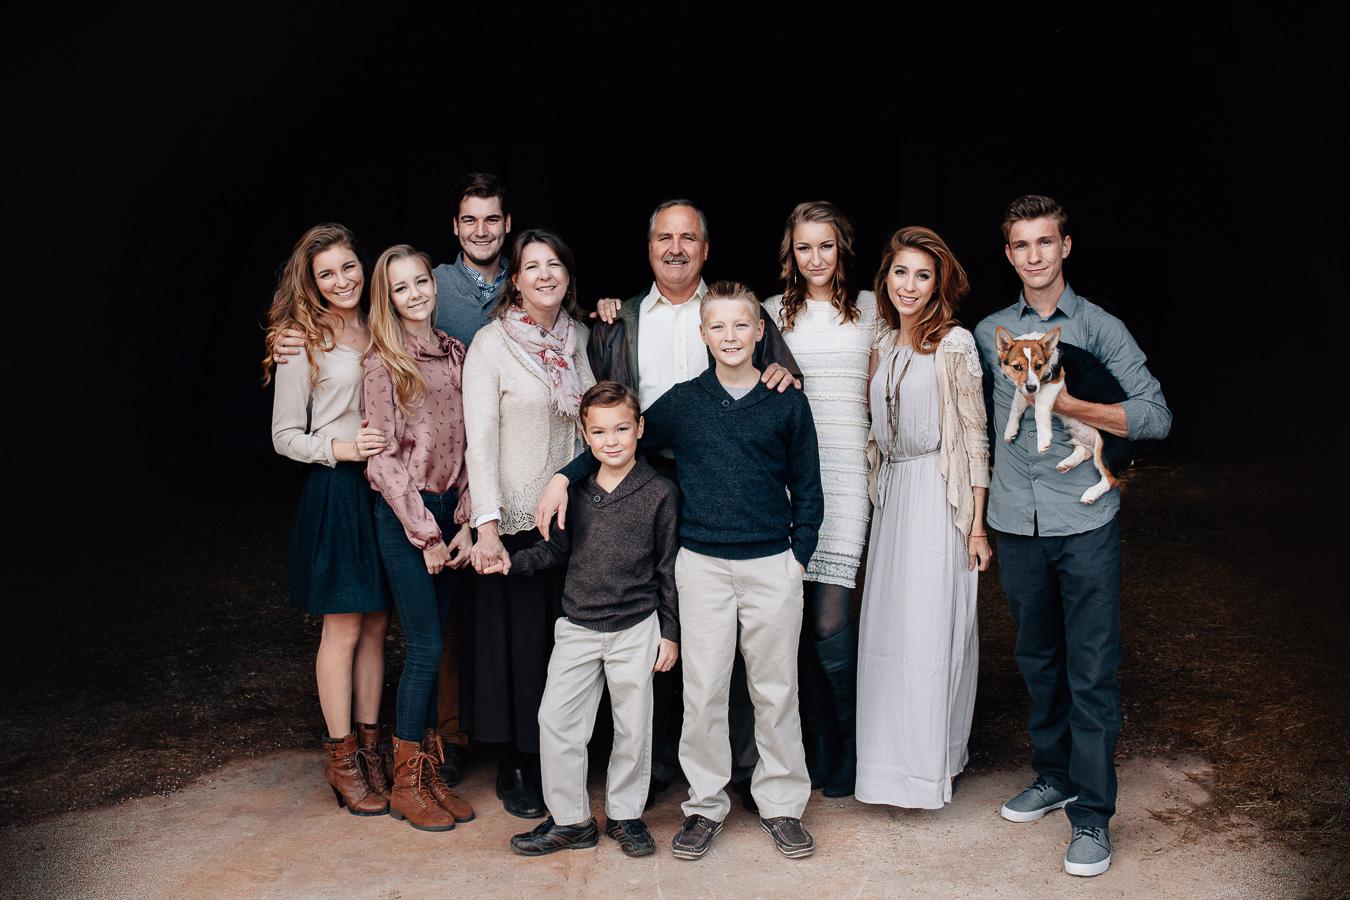 texas family portrait anna kraft 1.jpg